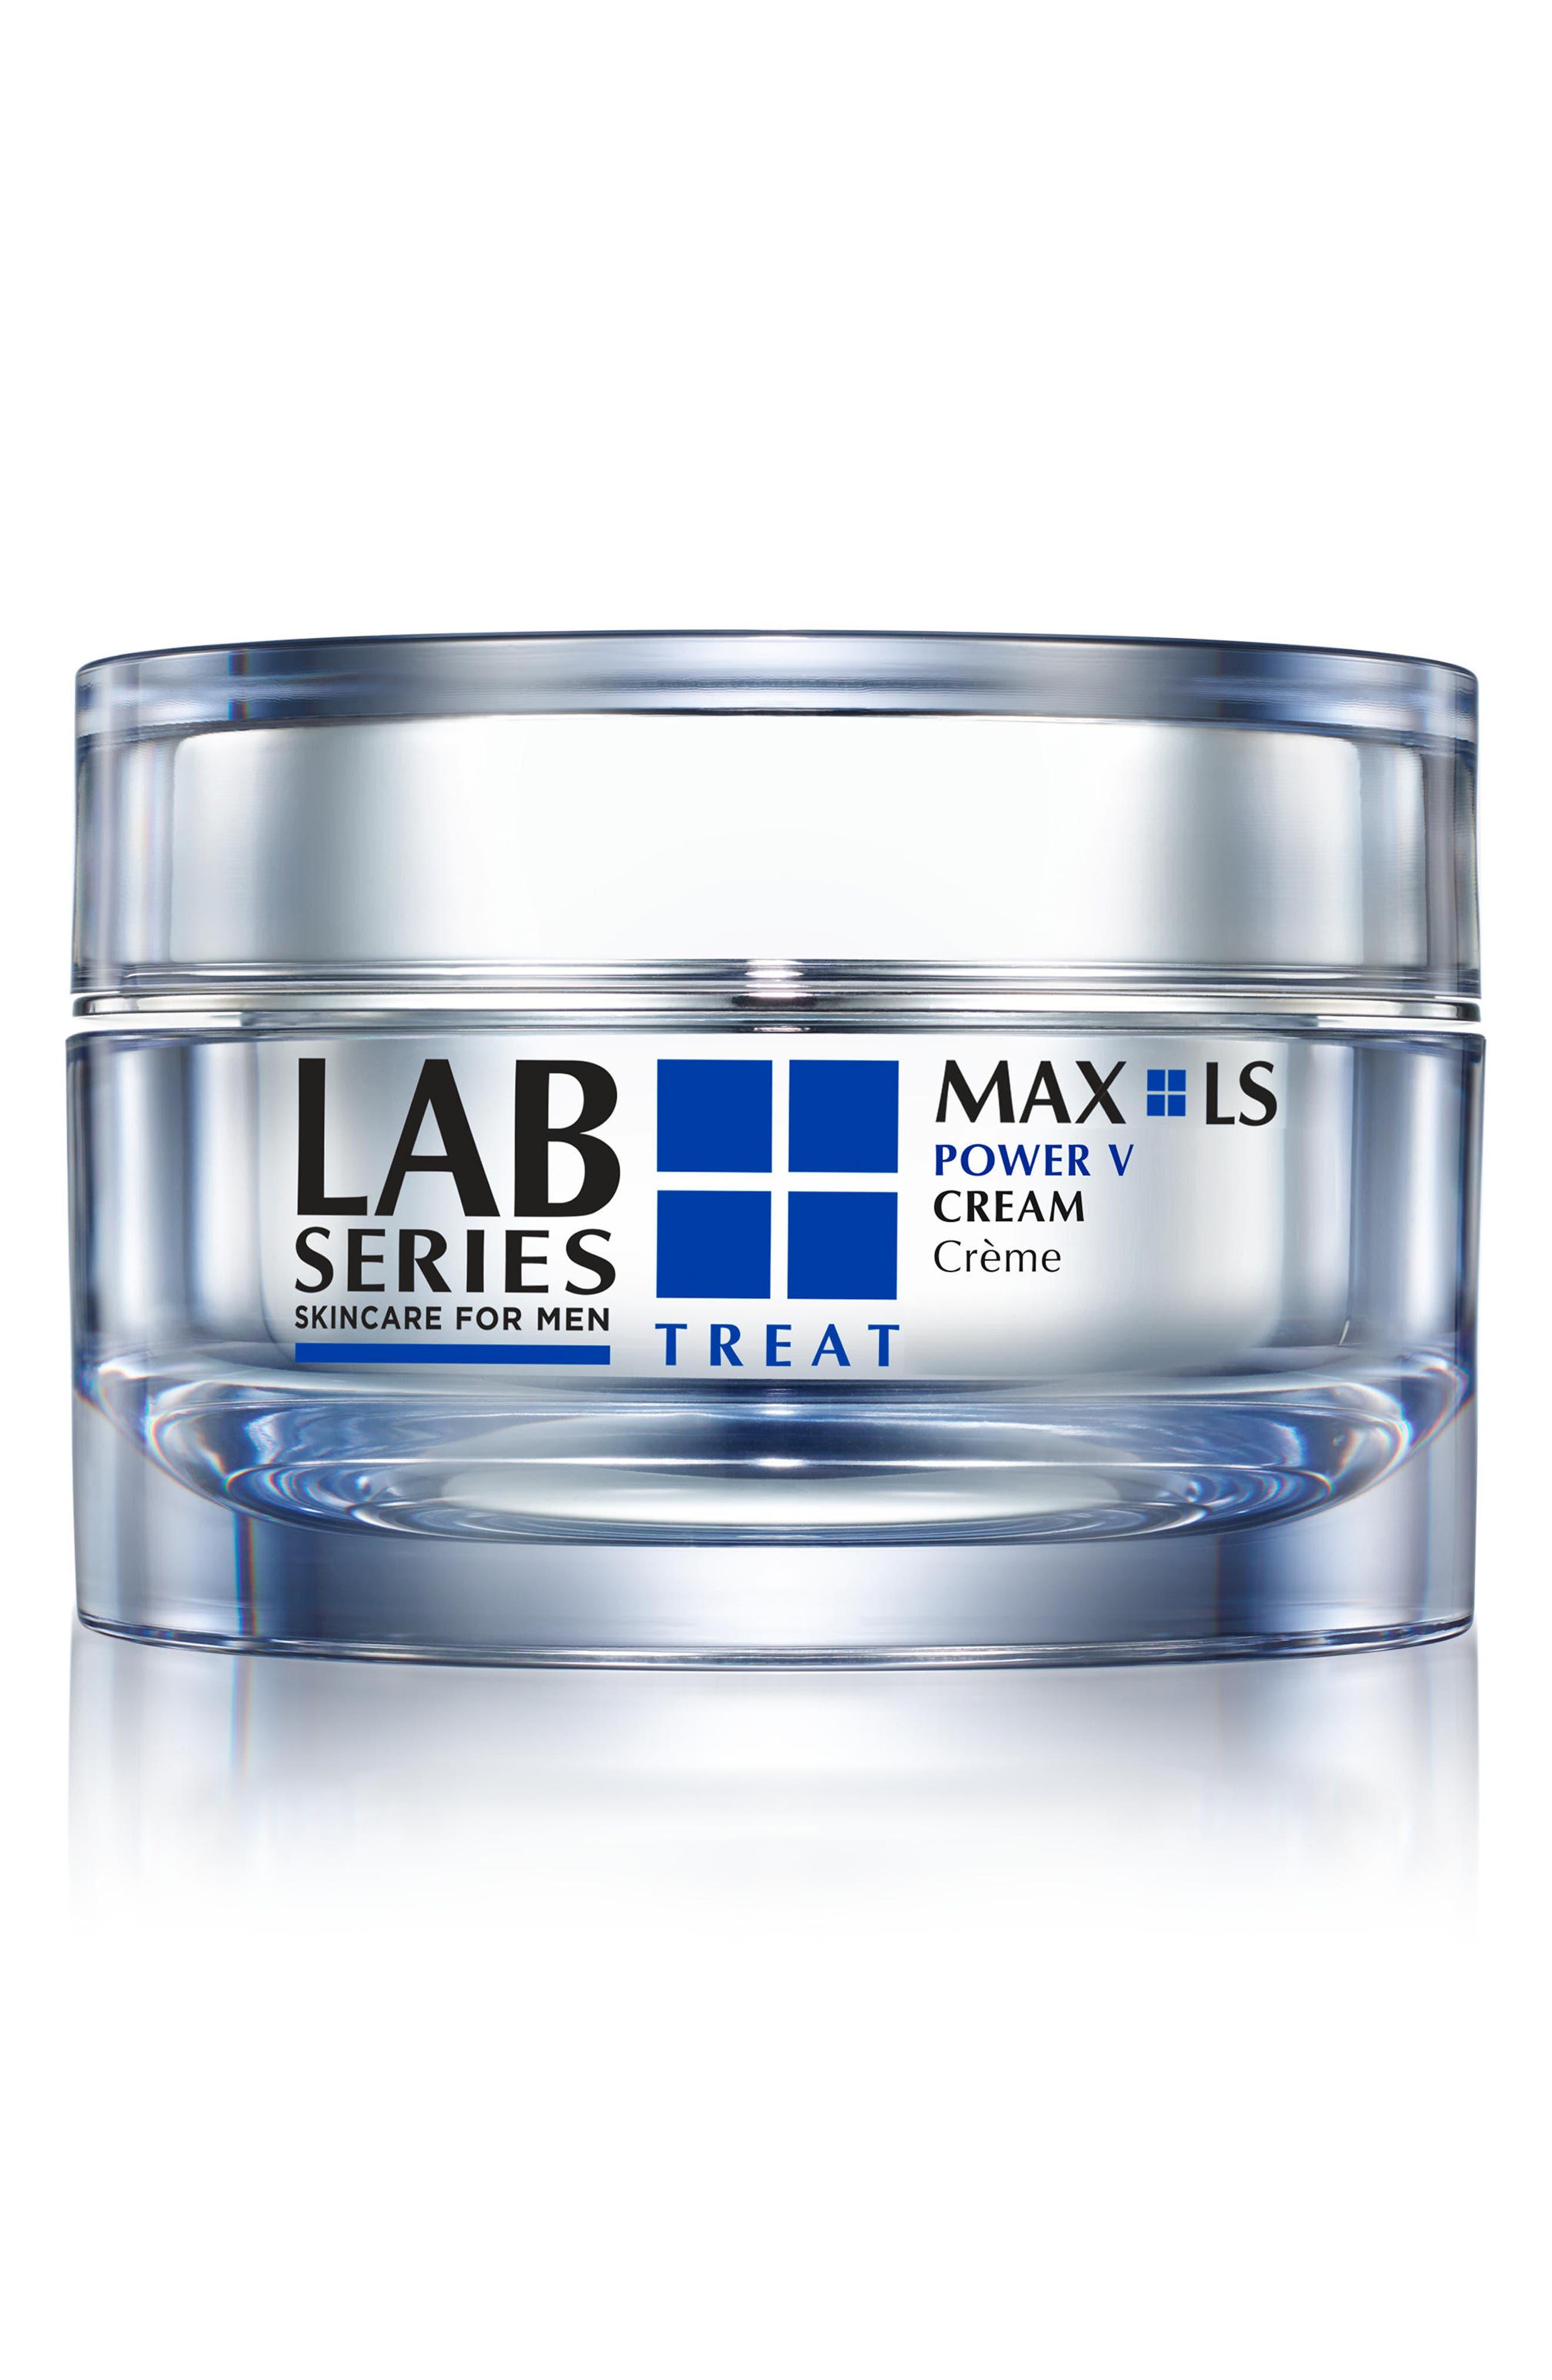 Max Ls Anti-Aging Power V Lifting Cream